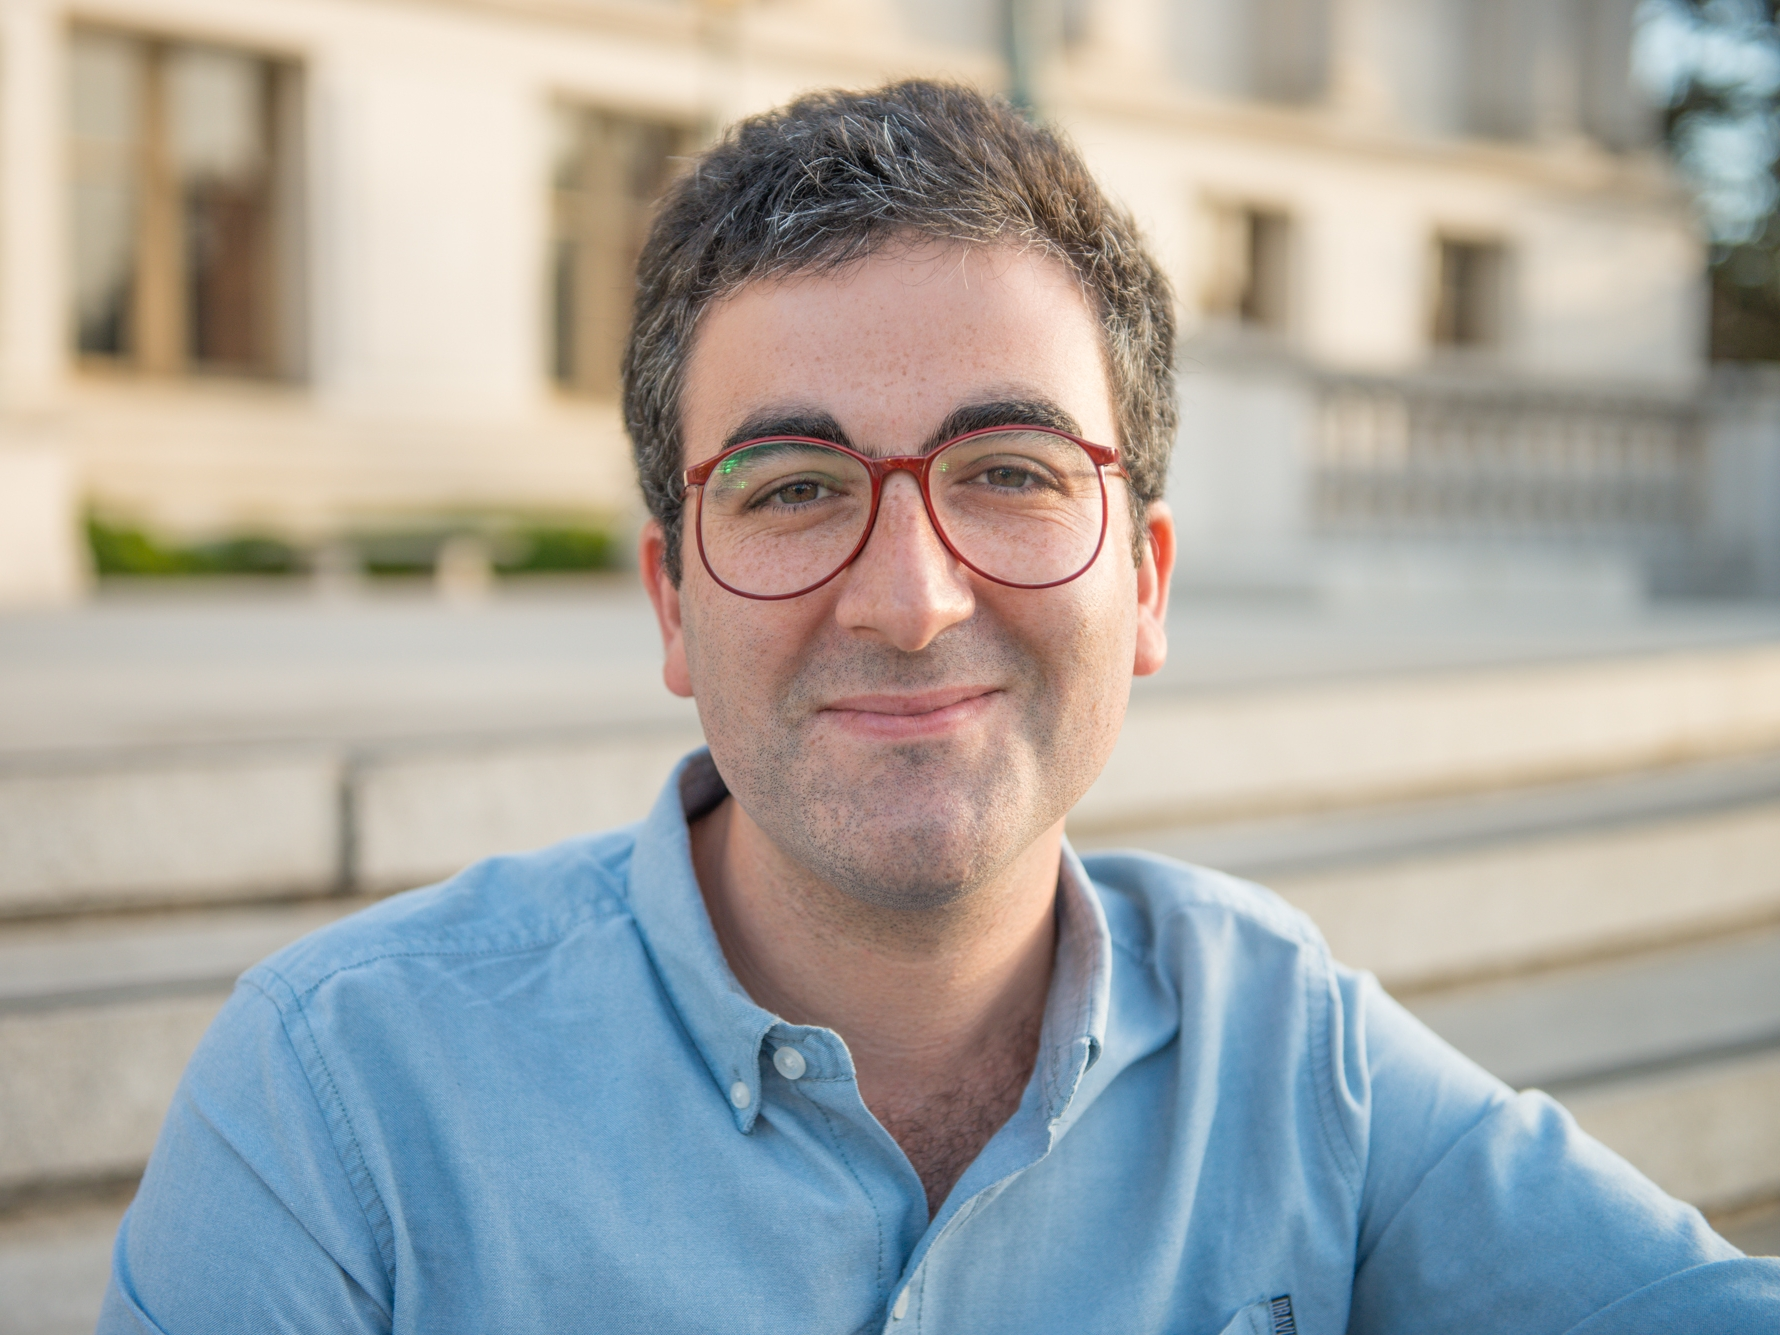 Felipe Gonzalez  PhD Candidate in Economics from UC Berkeley